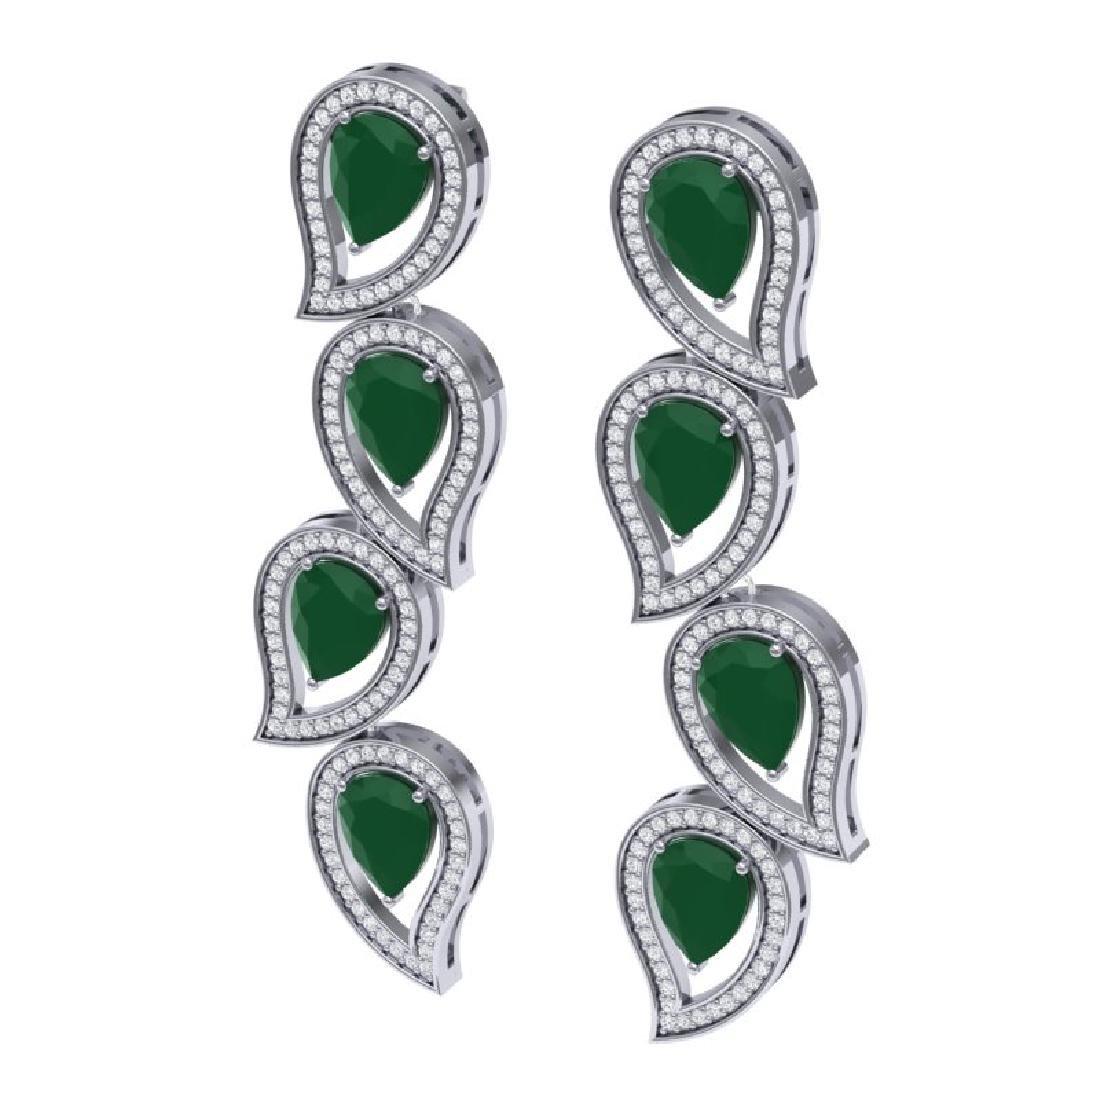 16.44 CTW Royalty Emerald & VS Diamond Earrings 18K - 2